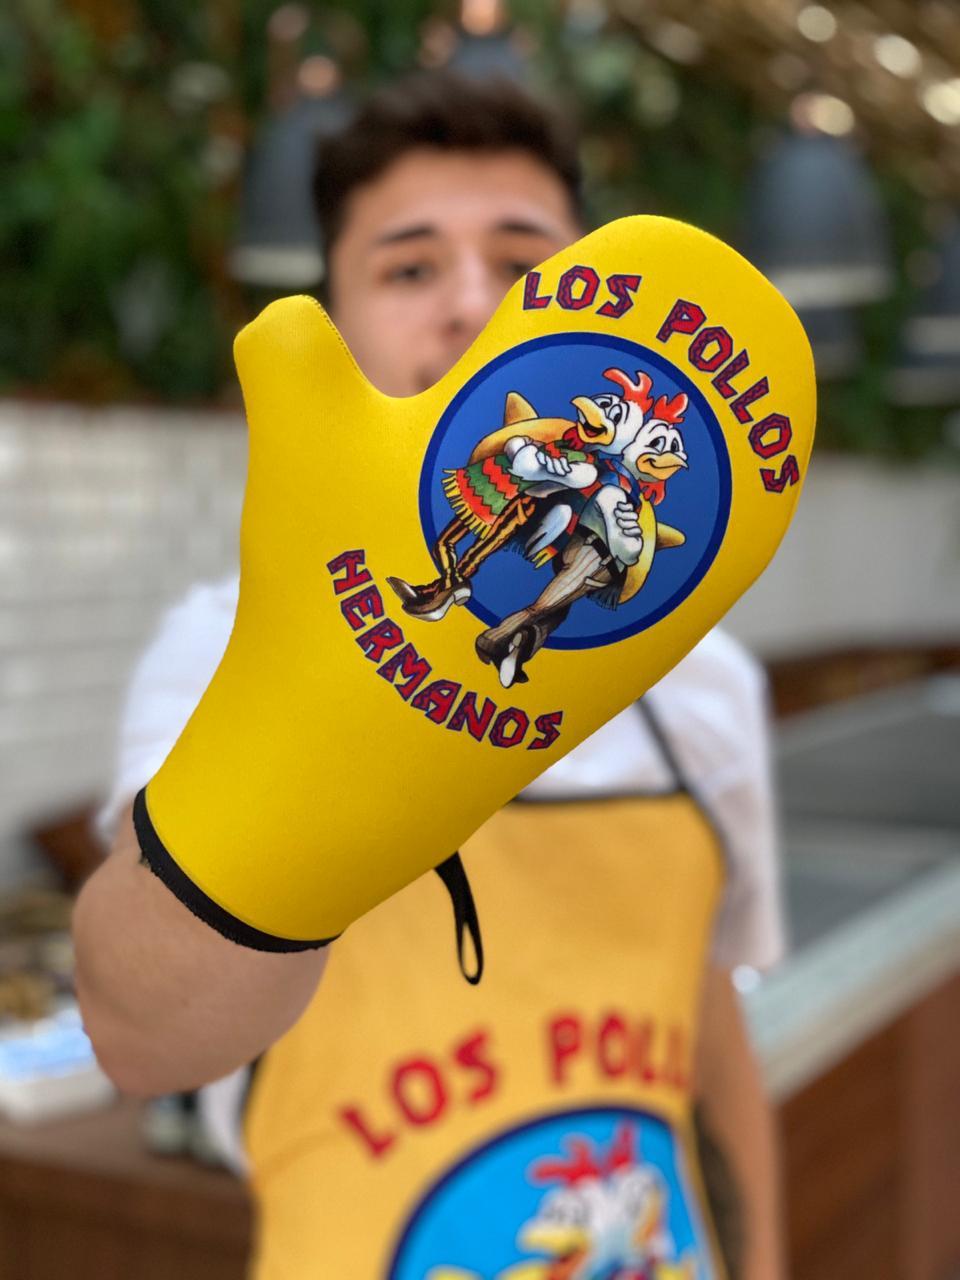 Luva de Forno/Cozinha Pollos: Breaking Bad